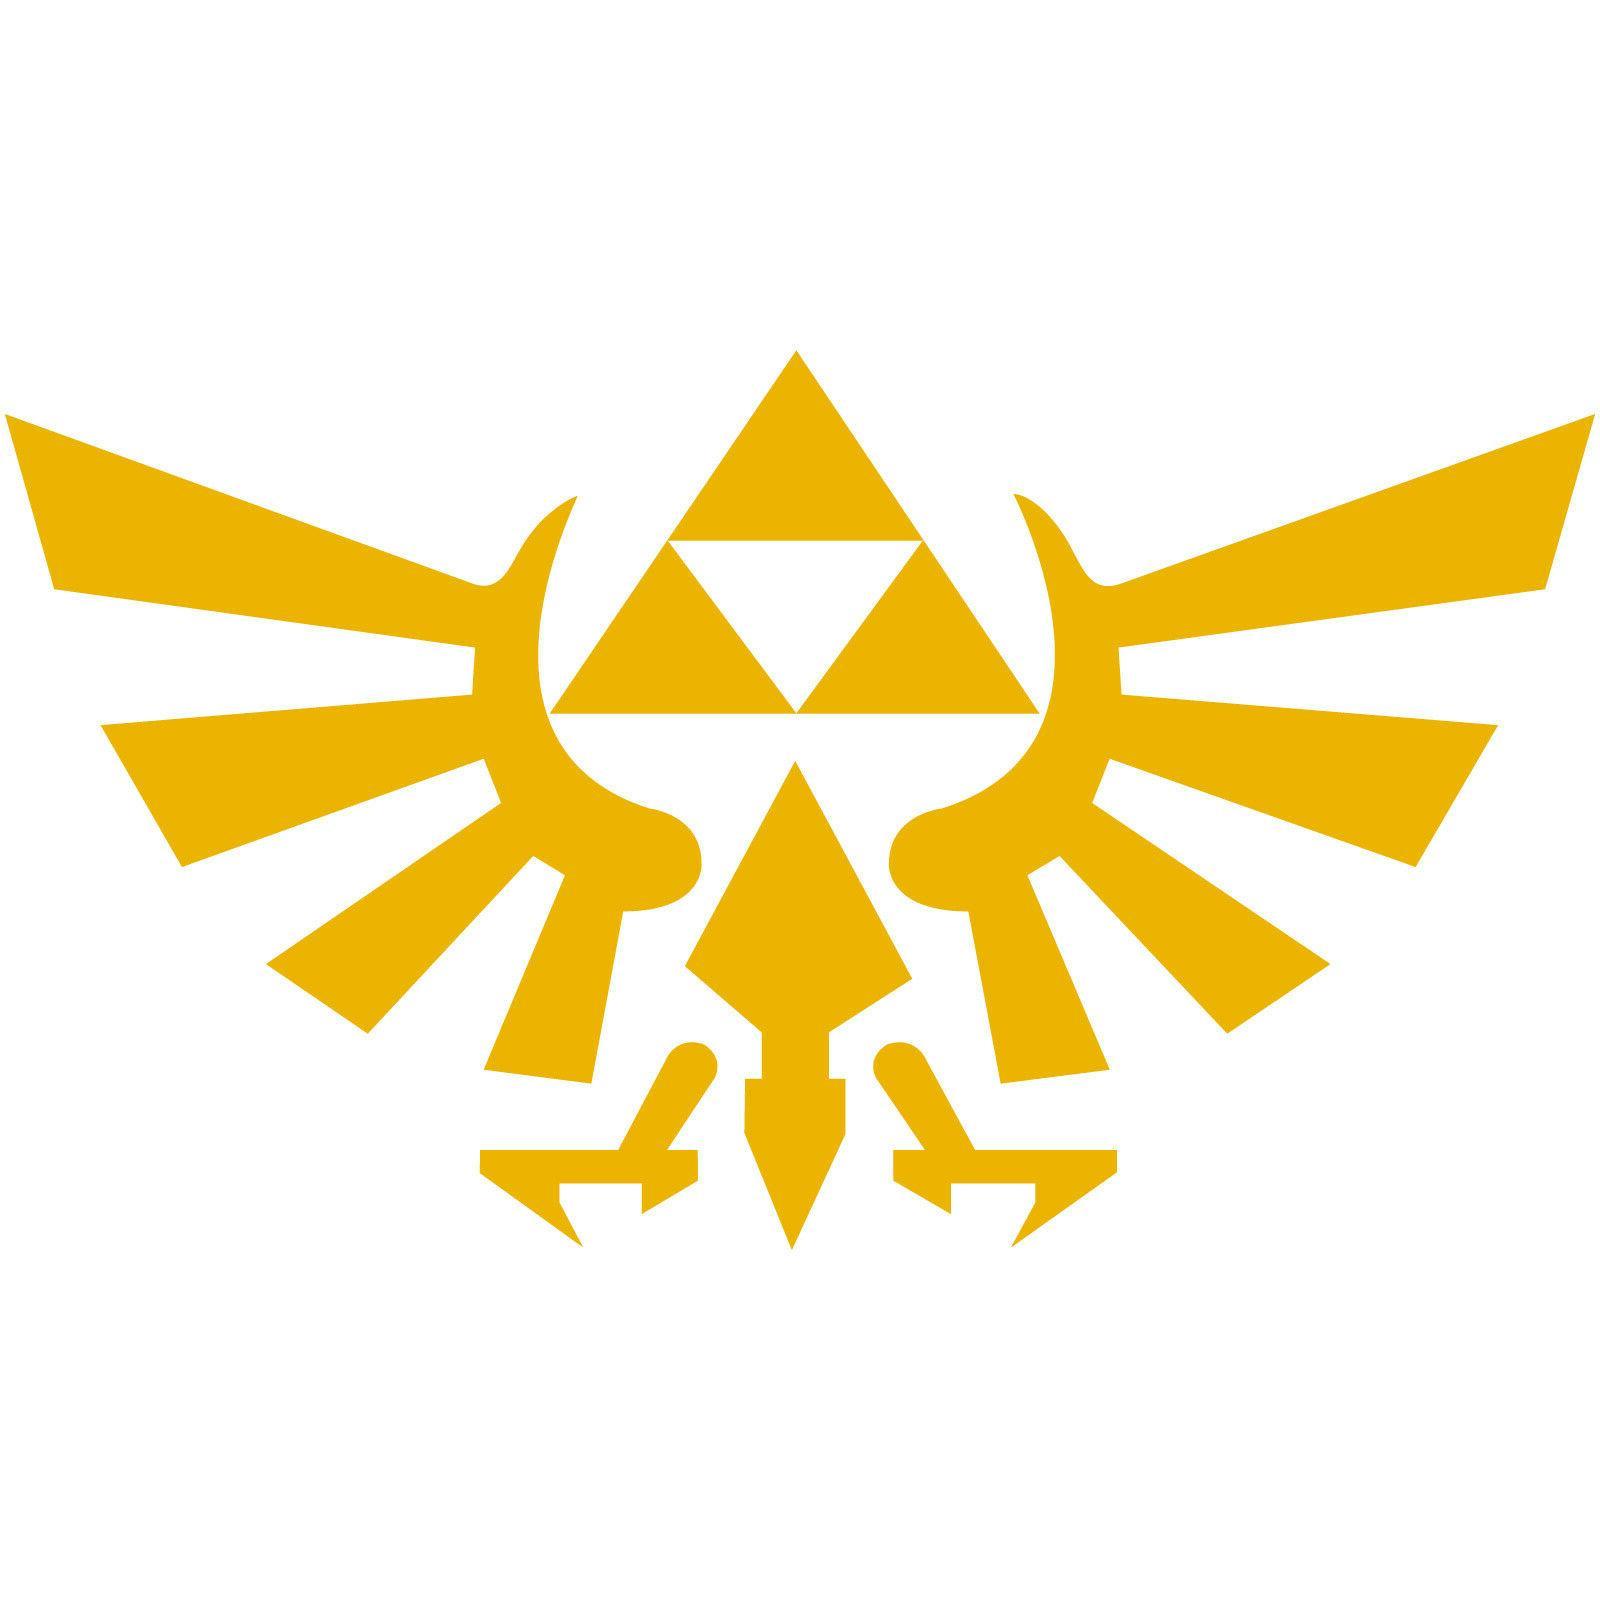 hyrule crest triforce logo 2 decal sticker